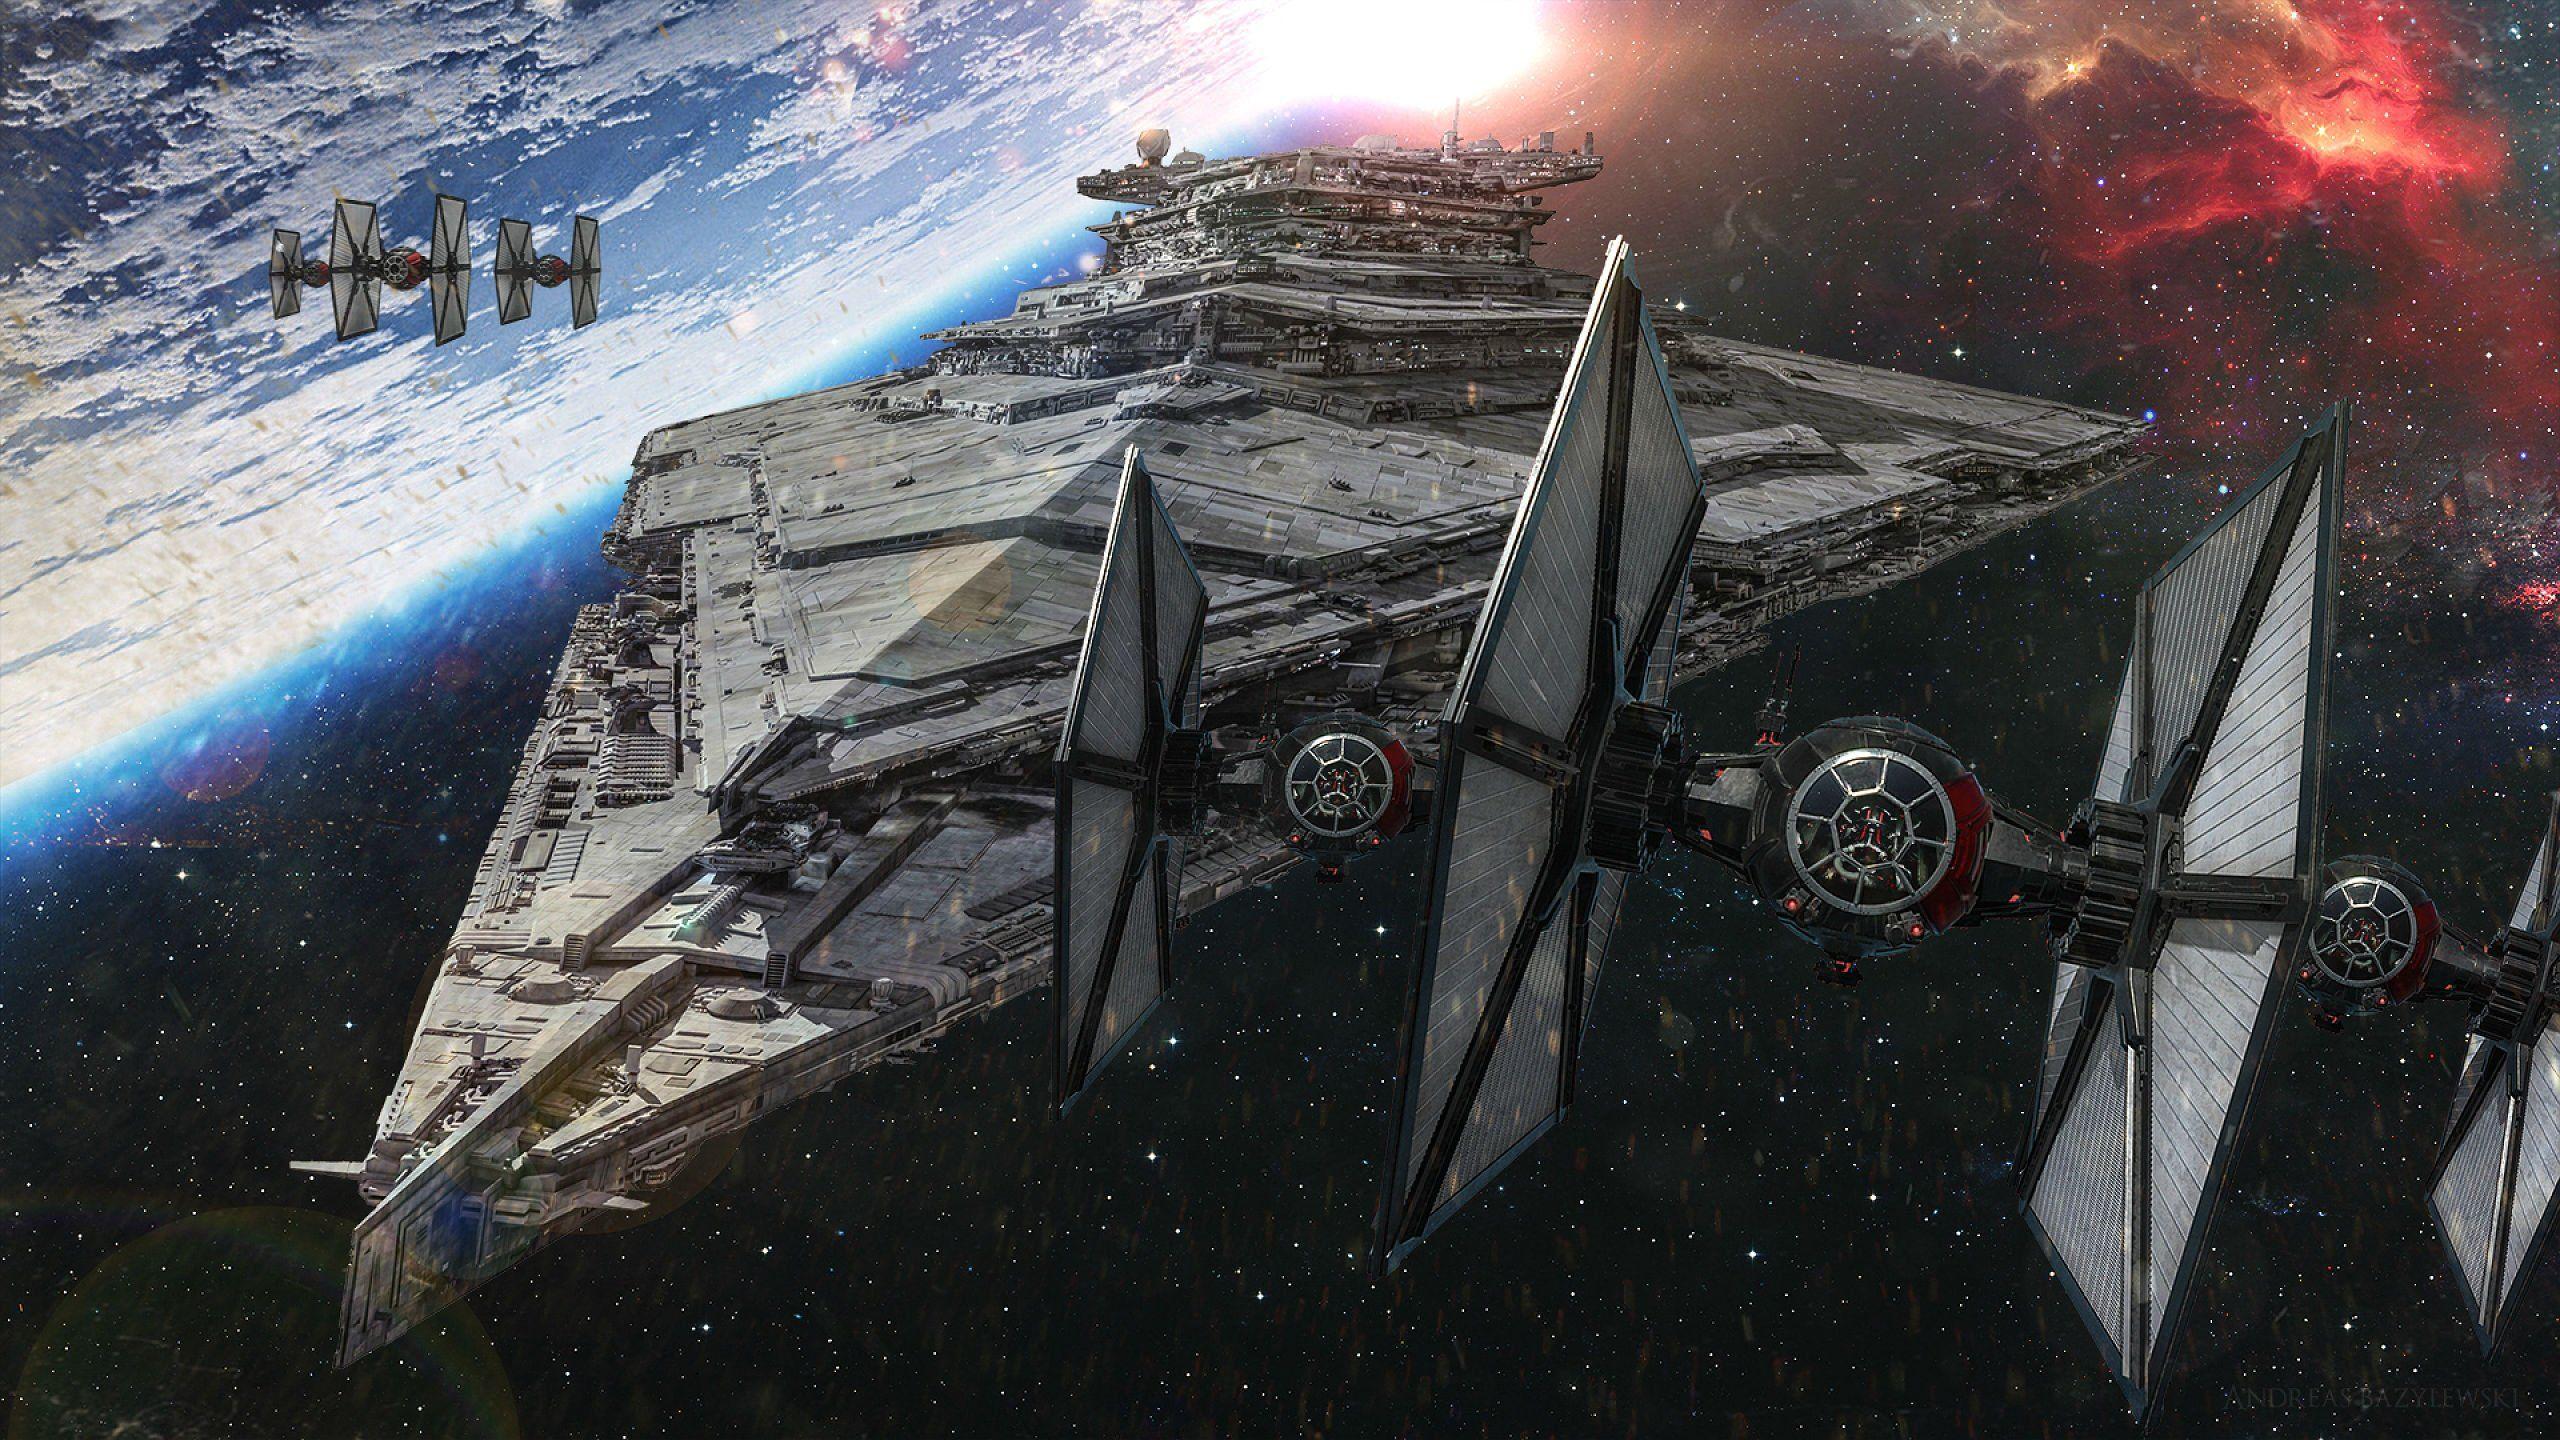 Star Wars Force Awakens Sci Fi Futuristic Disney 1star Wars Force Awakens Action Adventure Spaceshi Ultimate Star Wars Star Wars Wallpaper Star Wars Spaceships